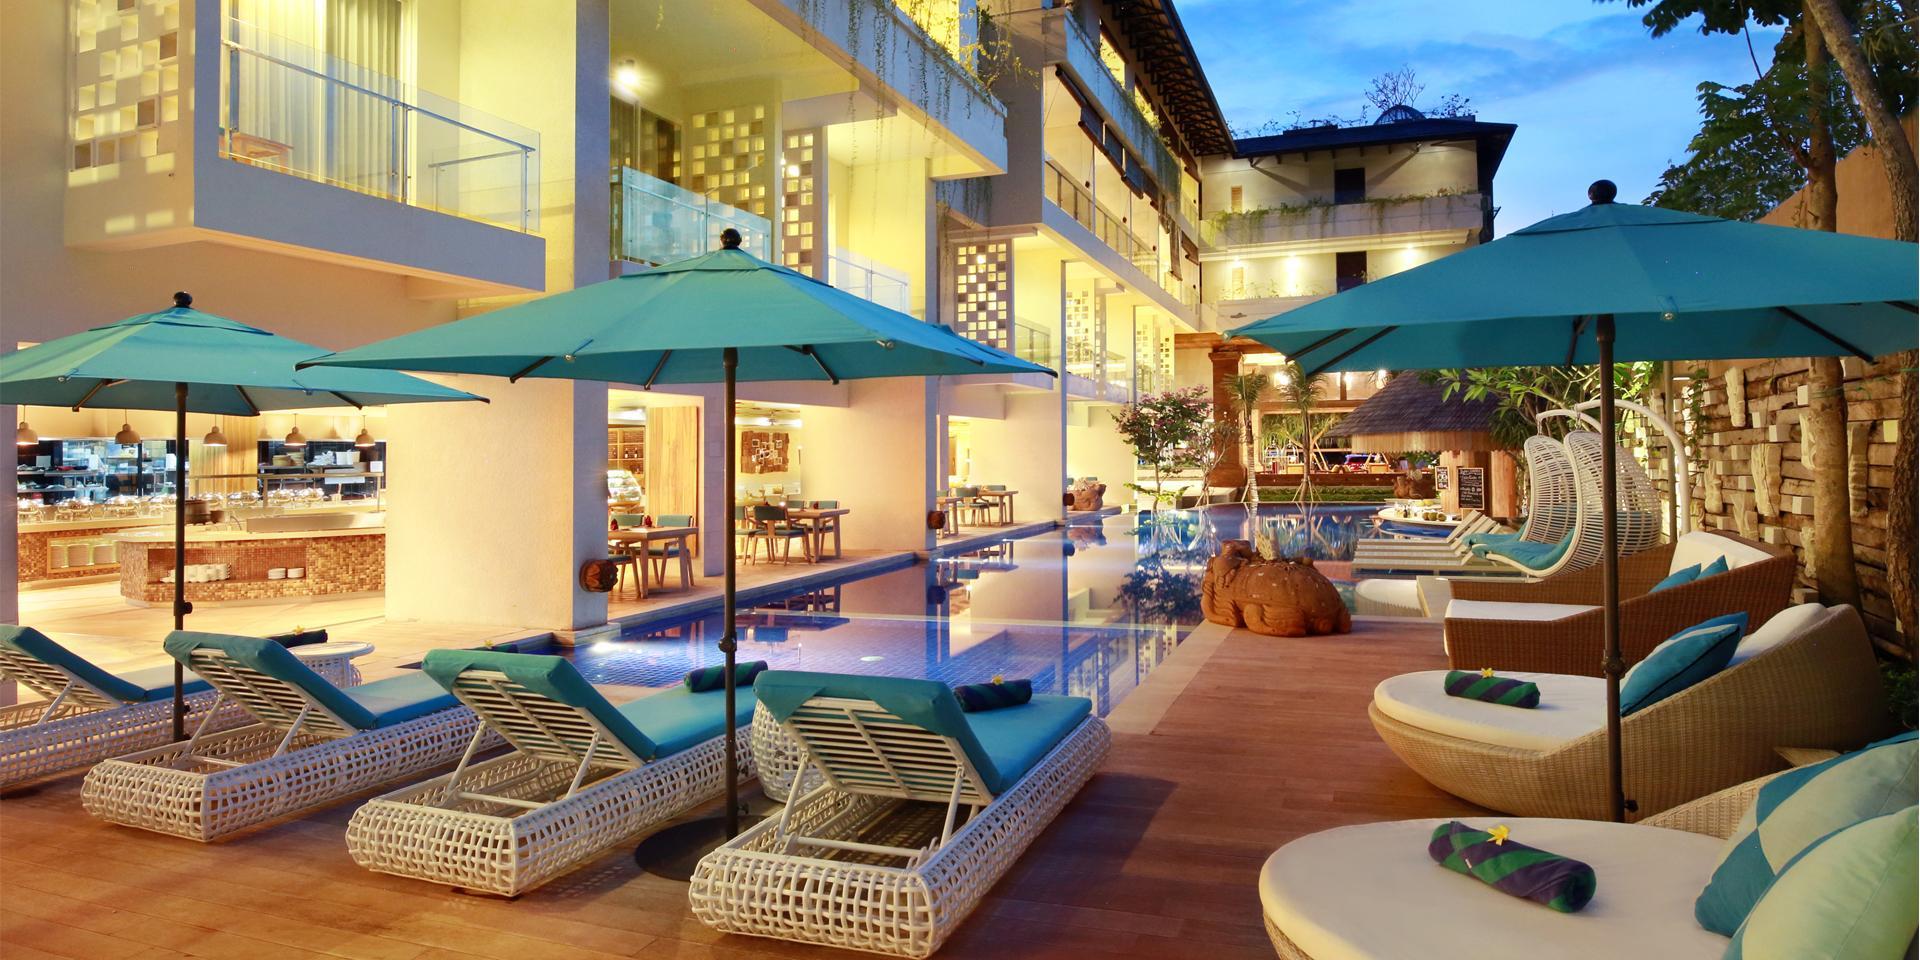 Jimbaran Bay Beach Resort and Spa